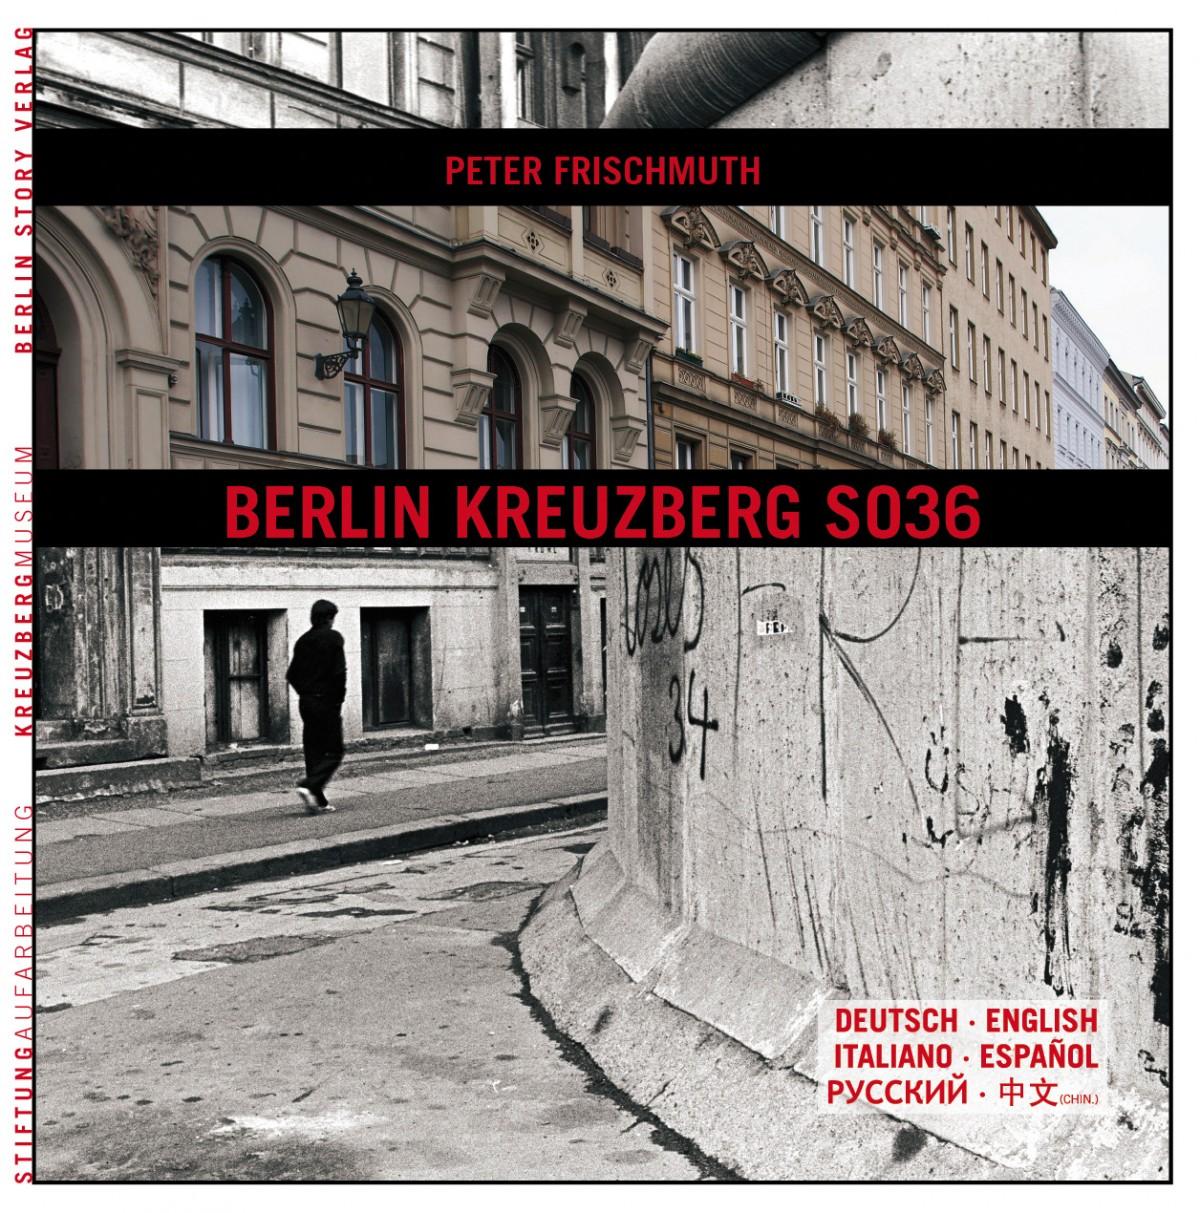 Berlin Kreuzberg SO36